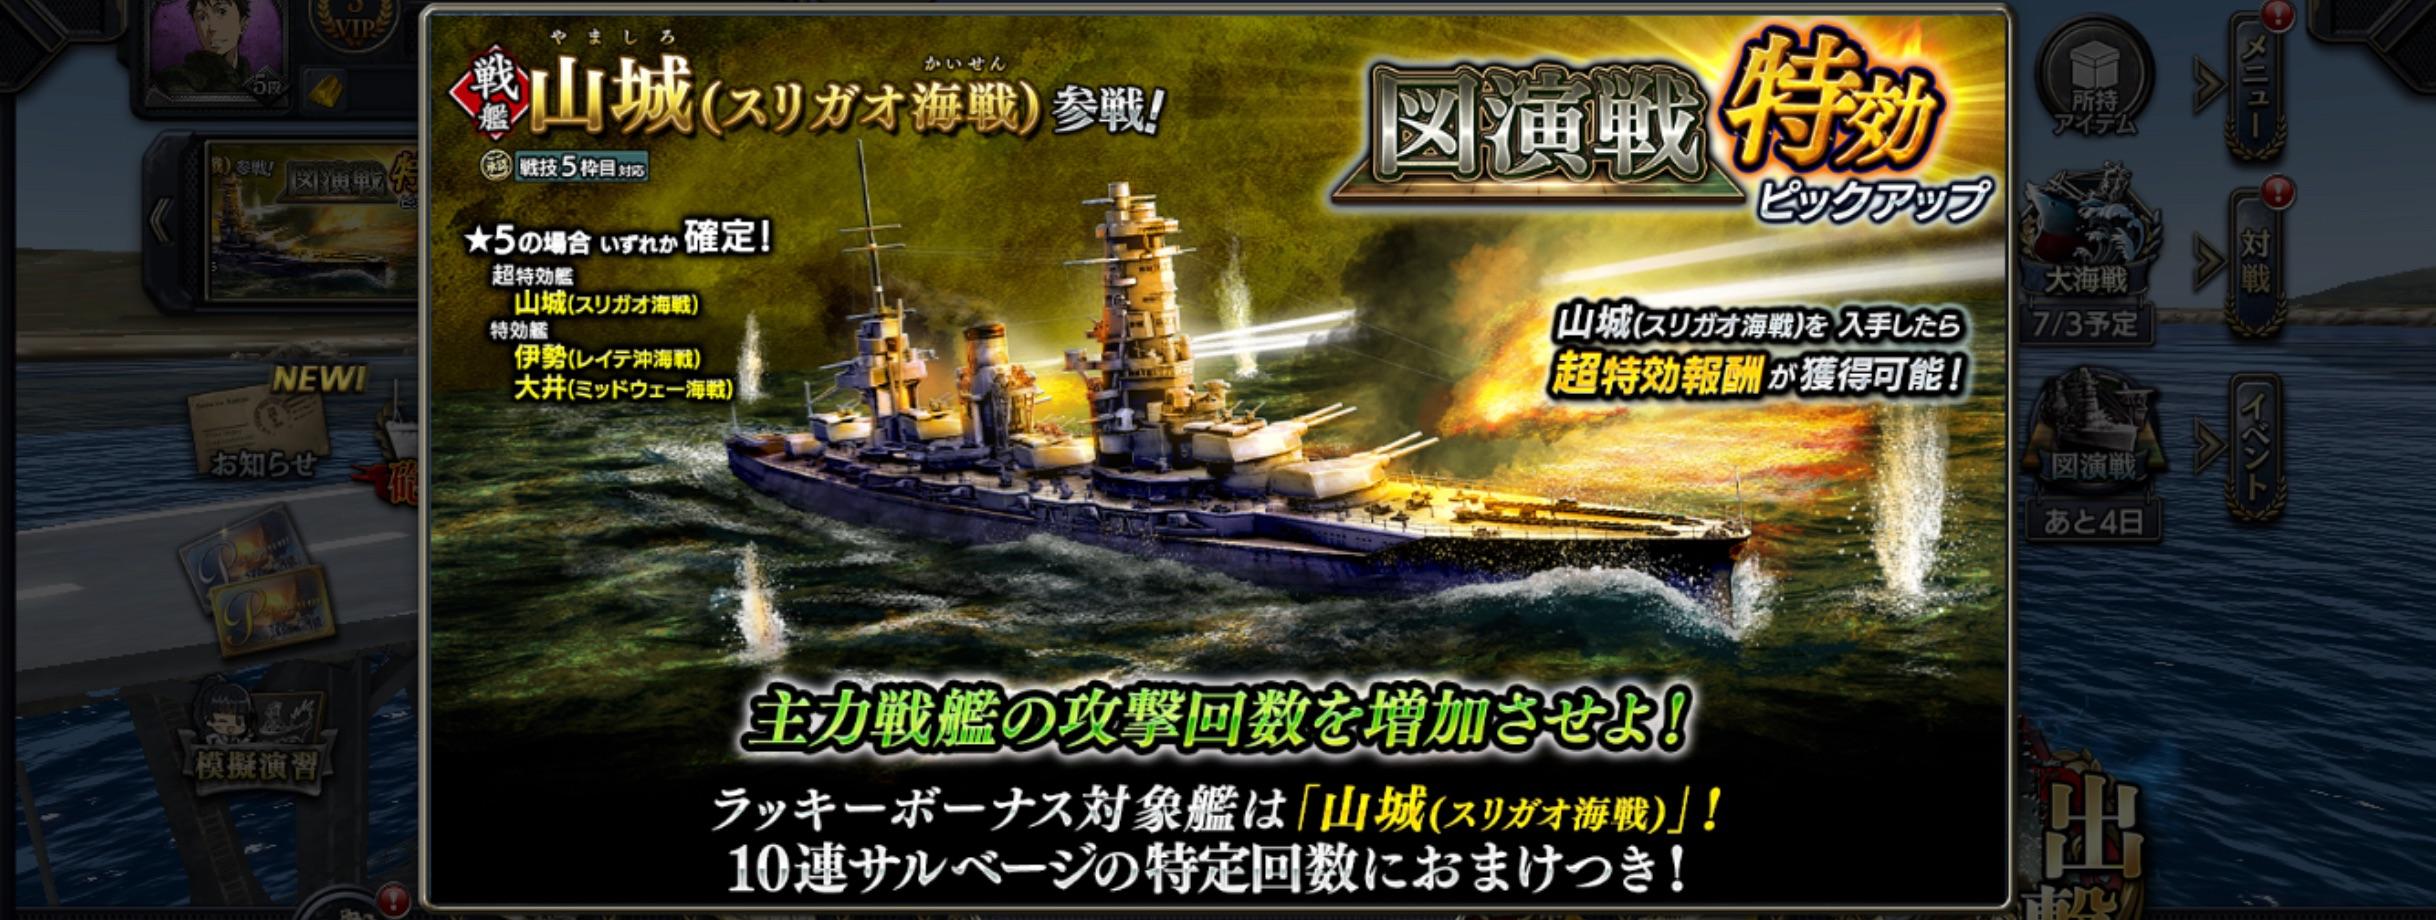 battleship-YamashiroS